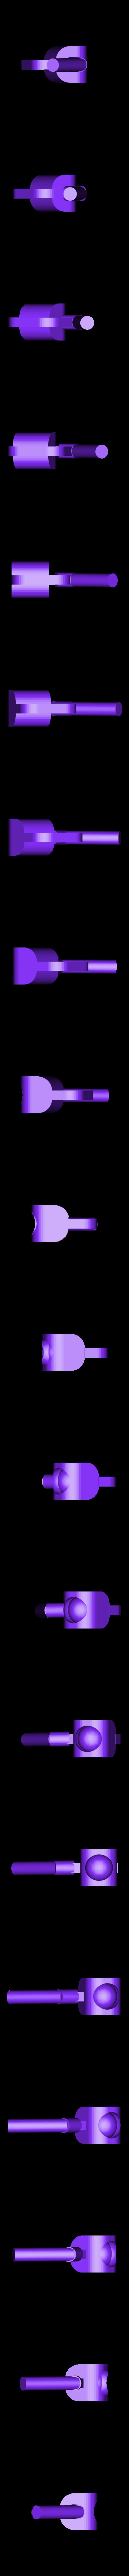 voor veeronder.stl Download free STL file quad (custom) • 3D printing design, jasperbaudoin